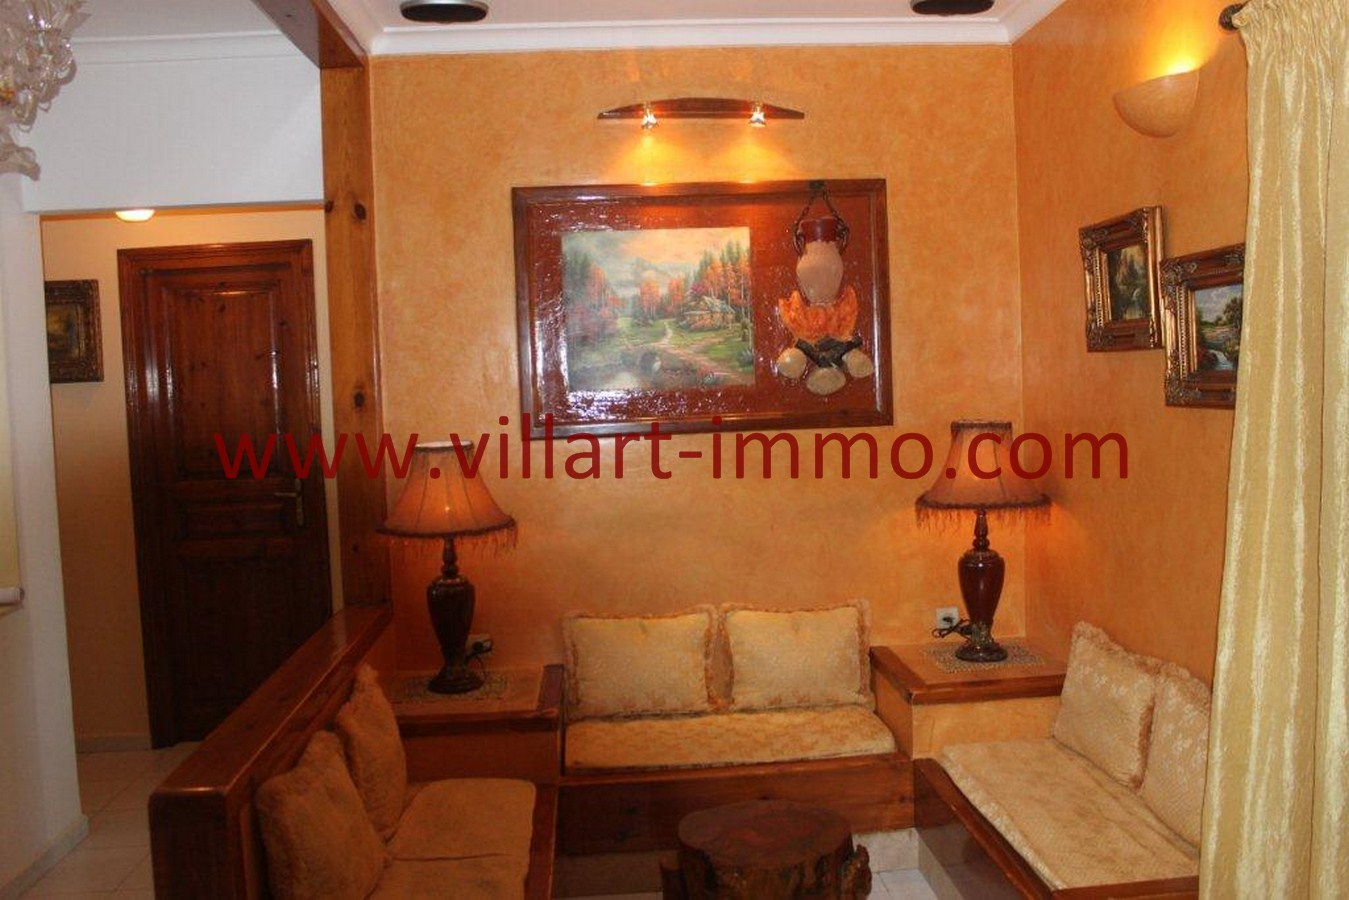 2-Vente-Appartement-Tanger-Dradab-Salon 2-VA549-Villart Immo